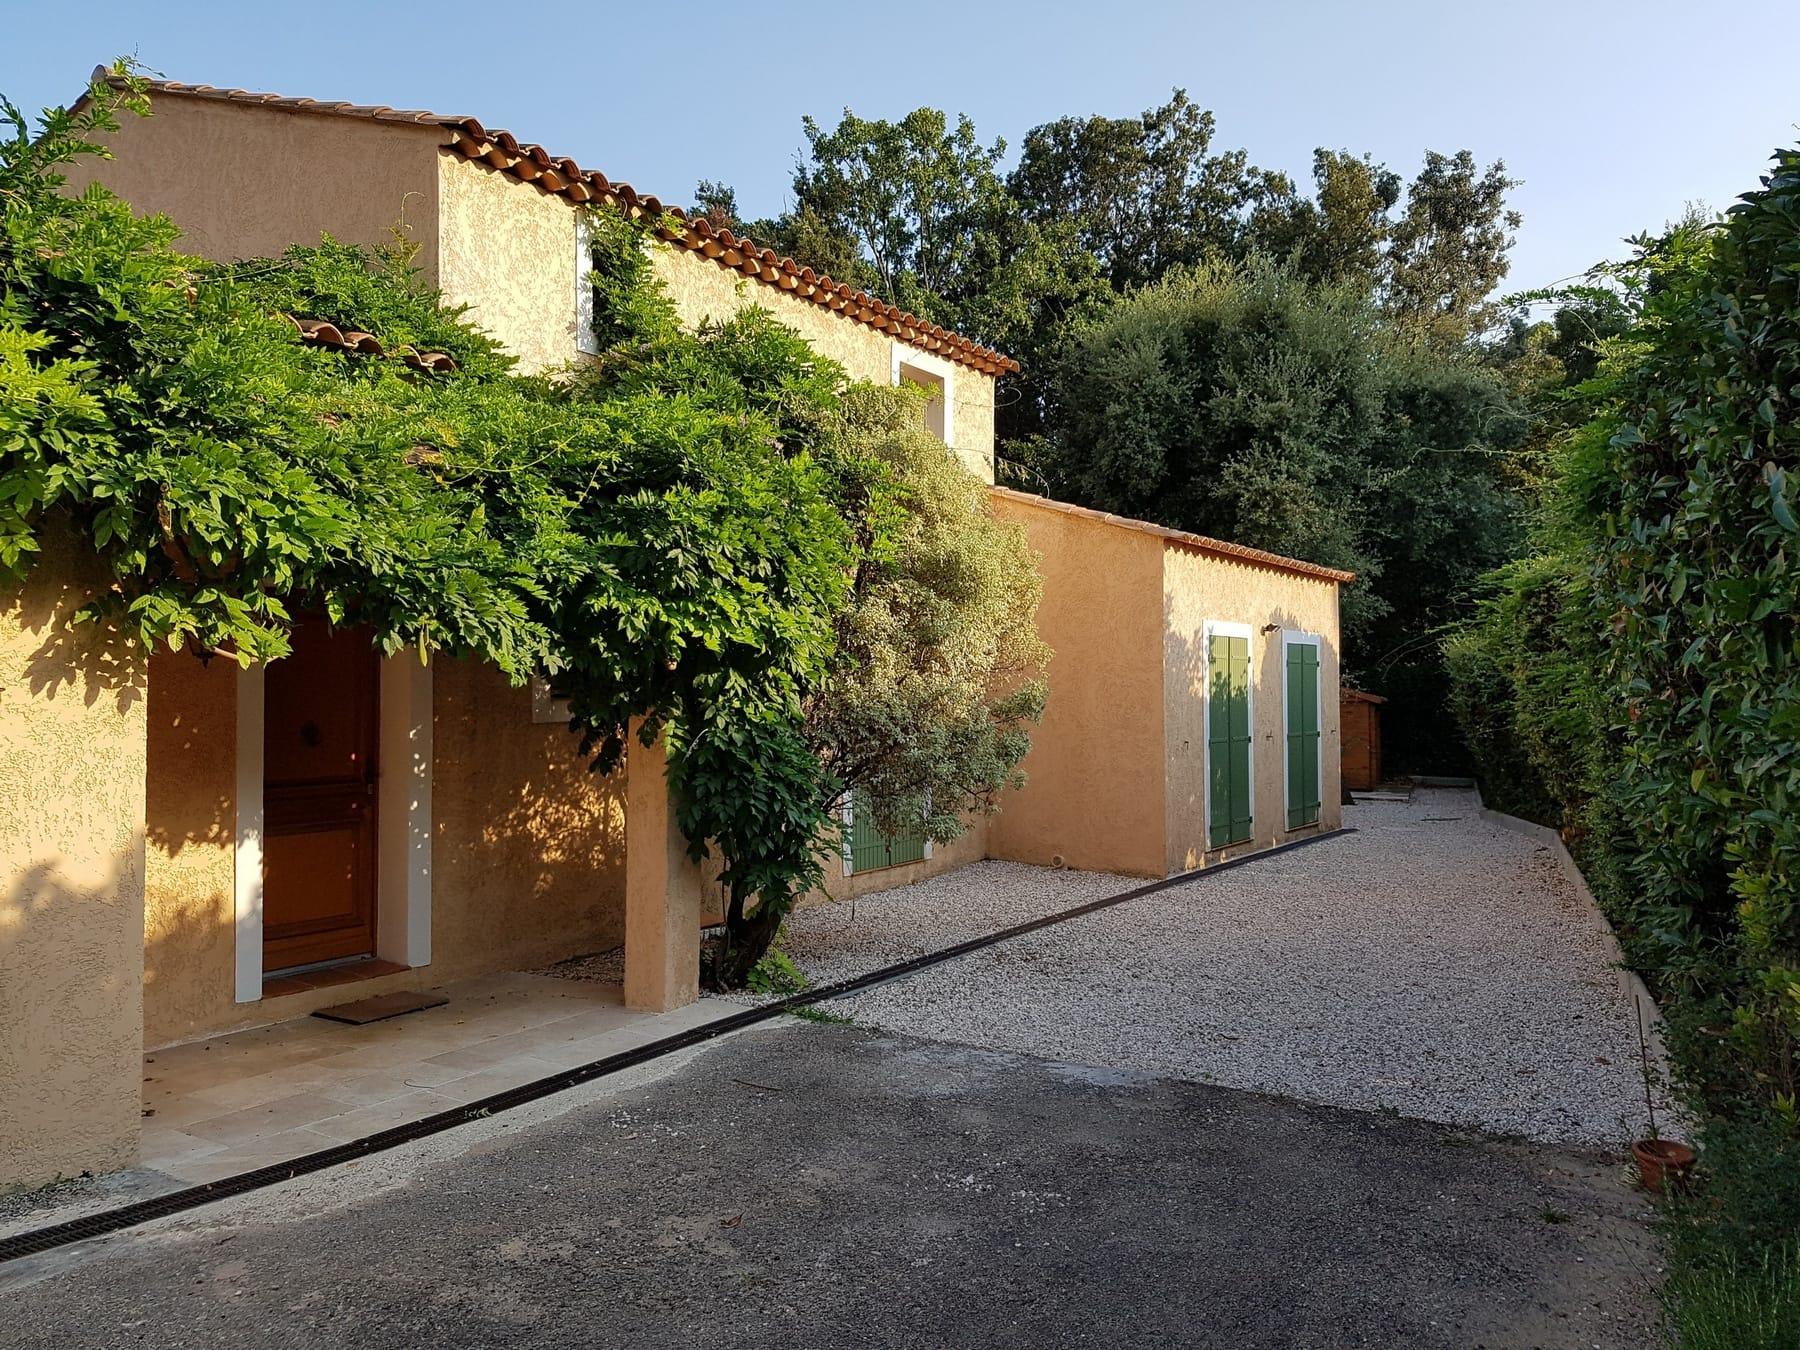 Villa Valbonne Cote d'Azur - Holiday home South of France